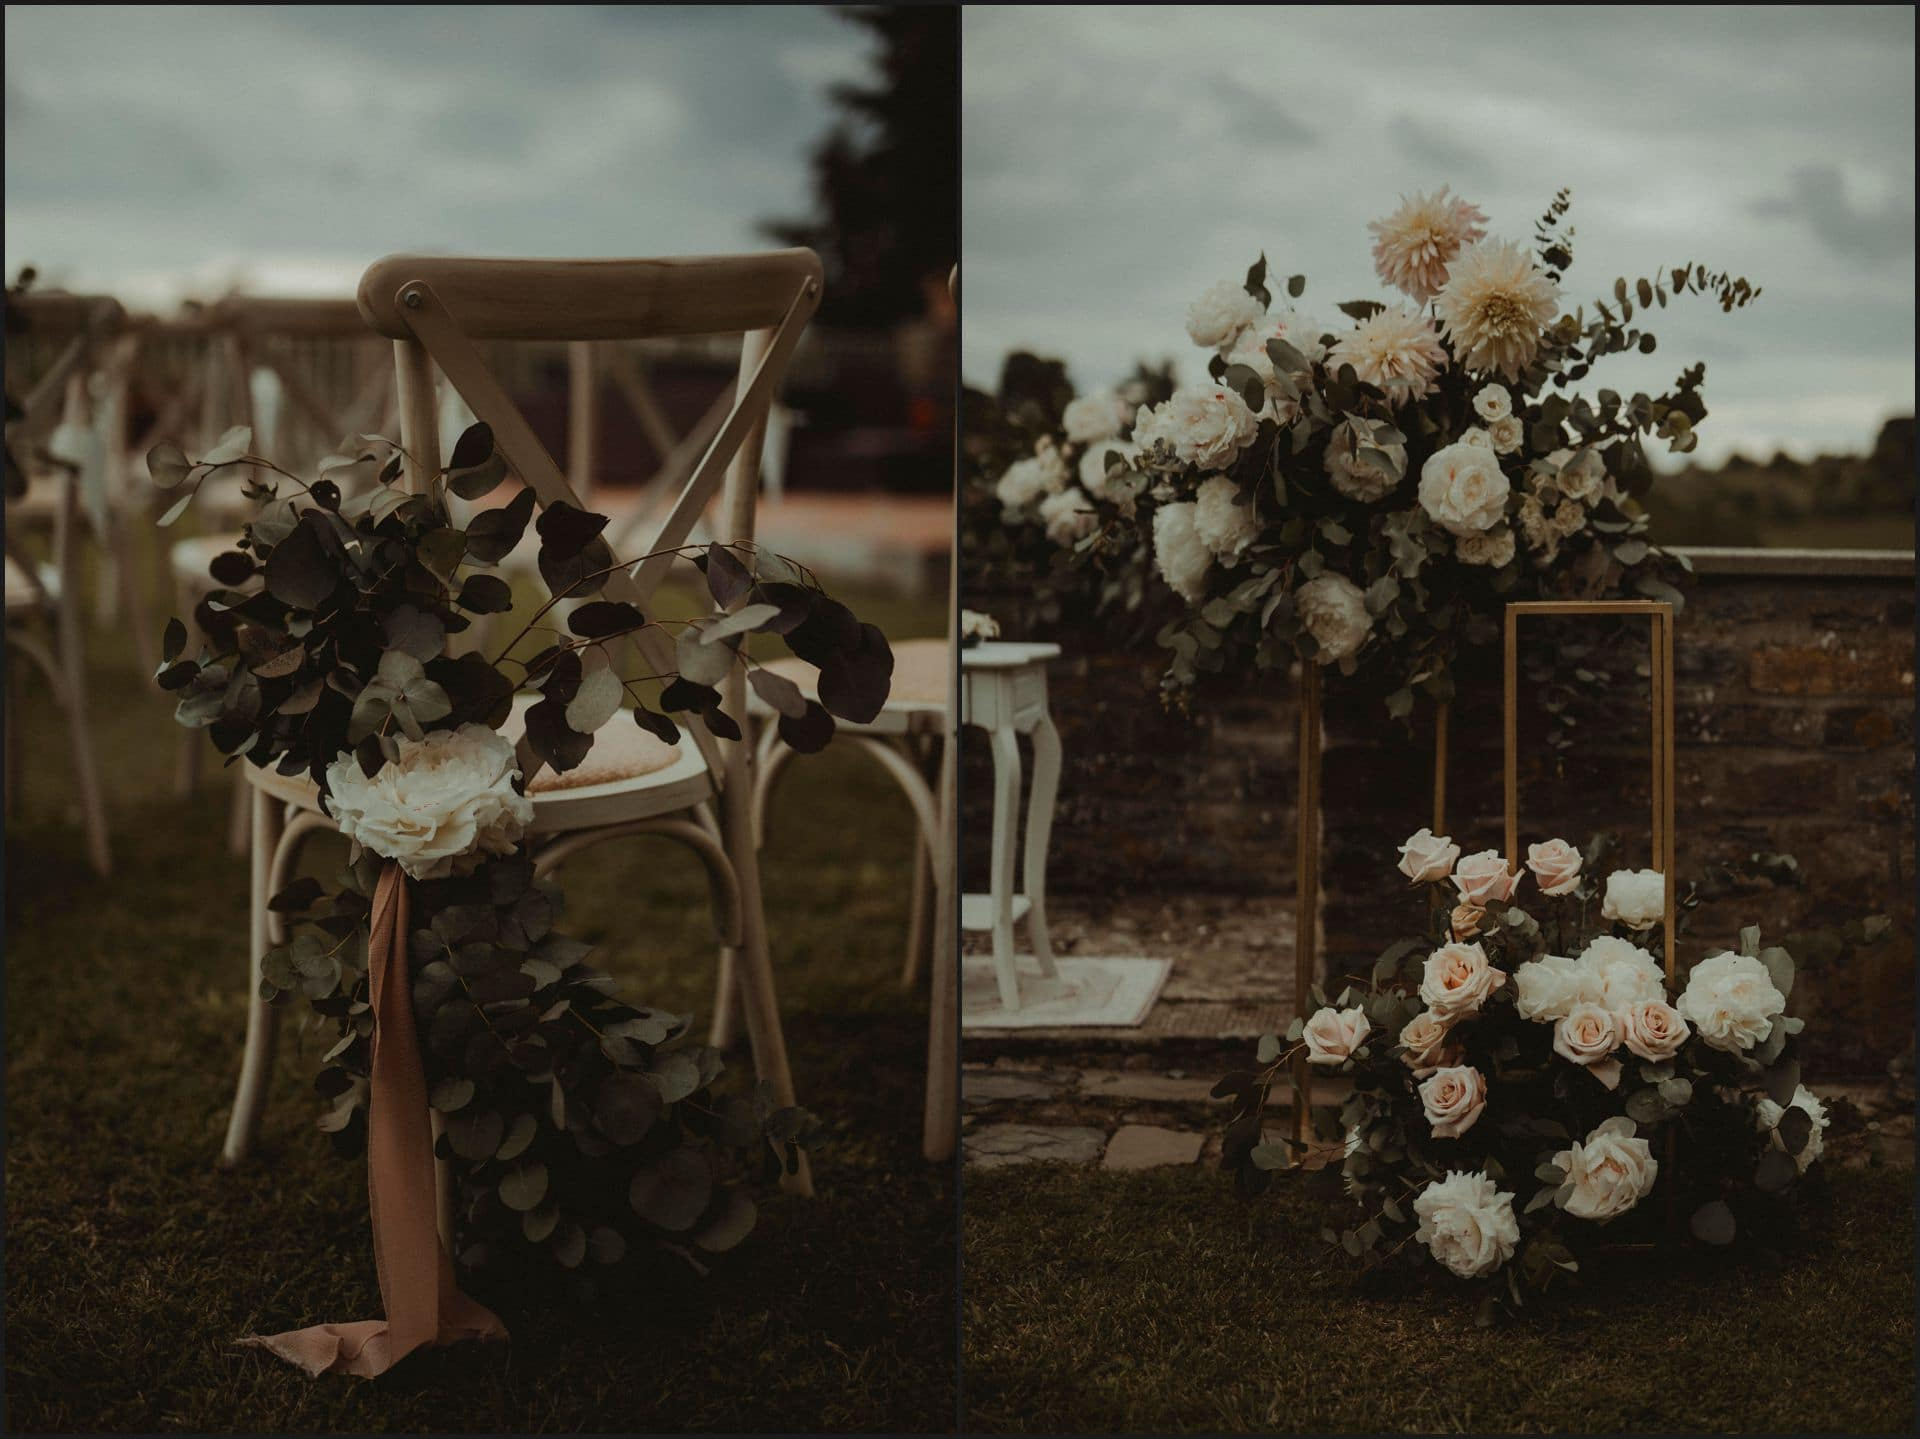 tuscany, destination wedding, chianti, flowers, details, wedding ceremony